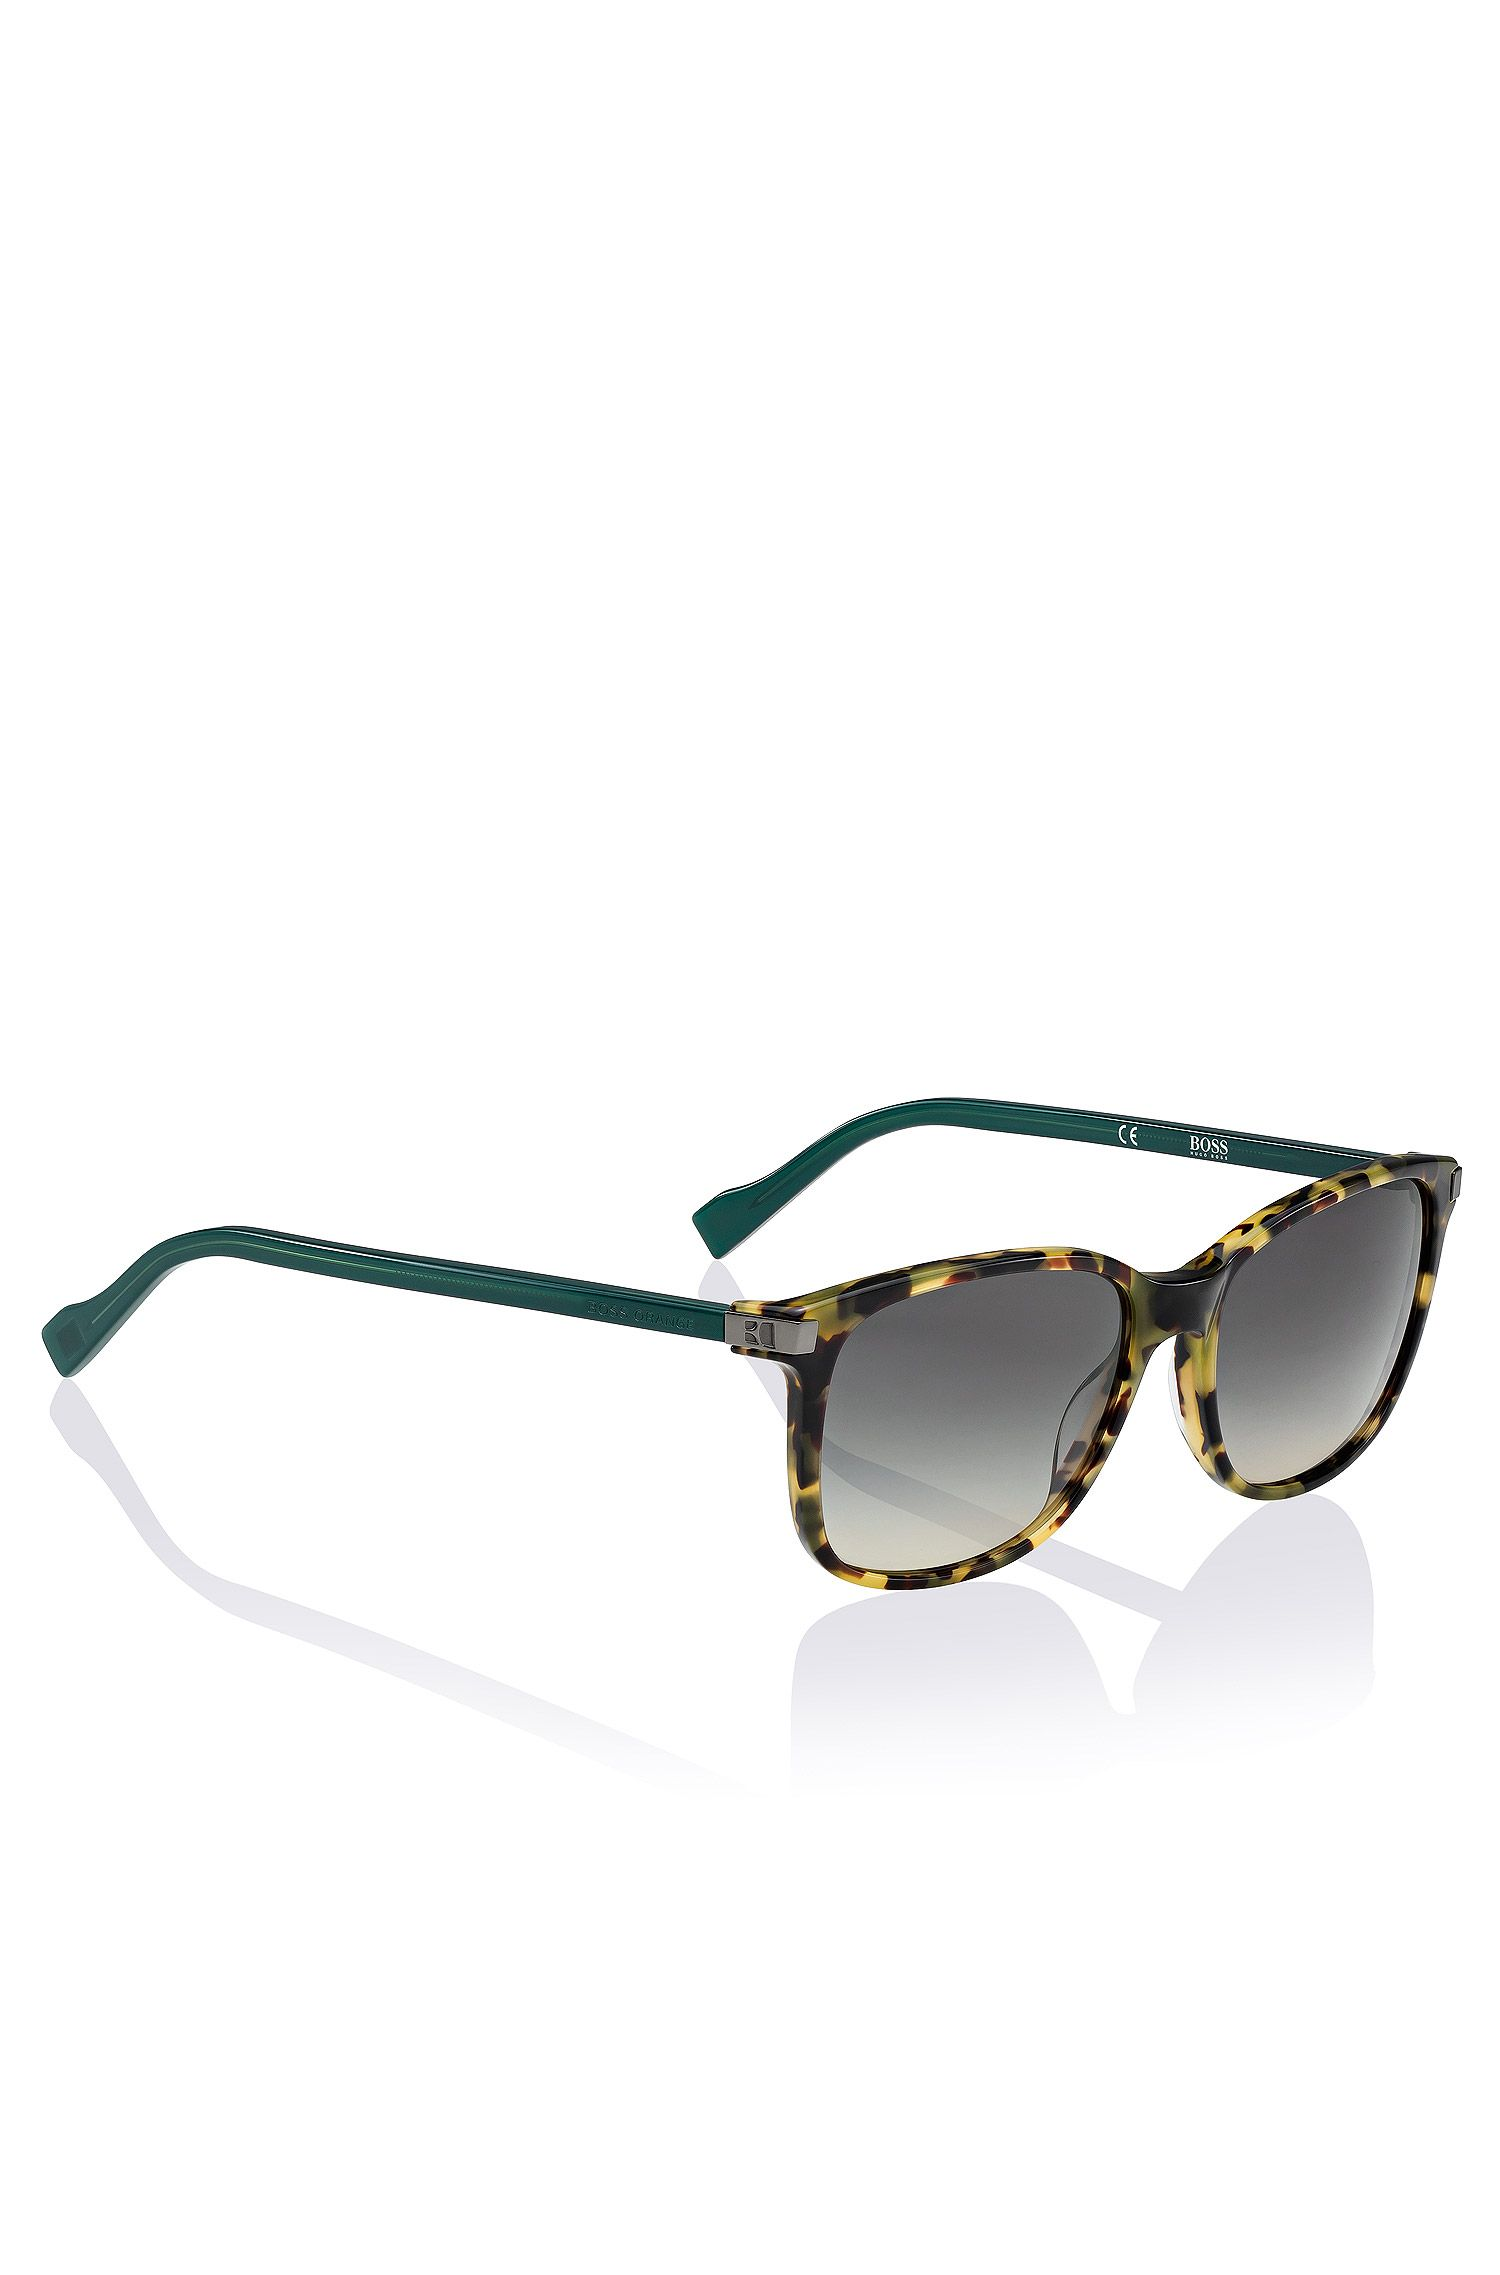 Vintage-zonnebril 'BO 0179/S' van acetaat